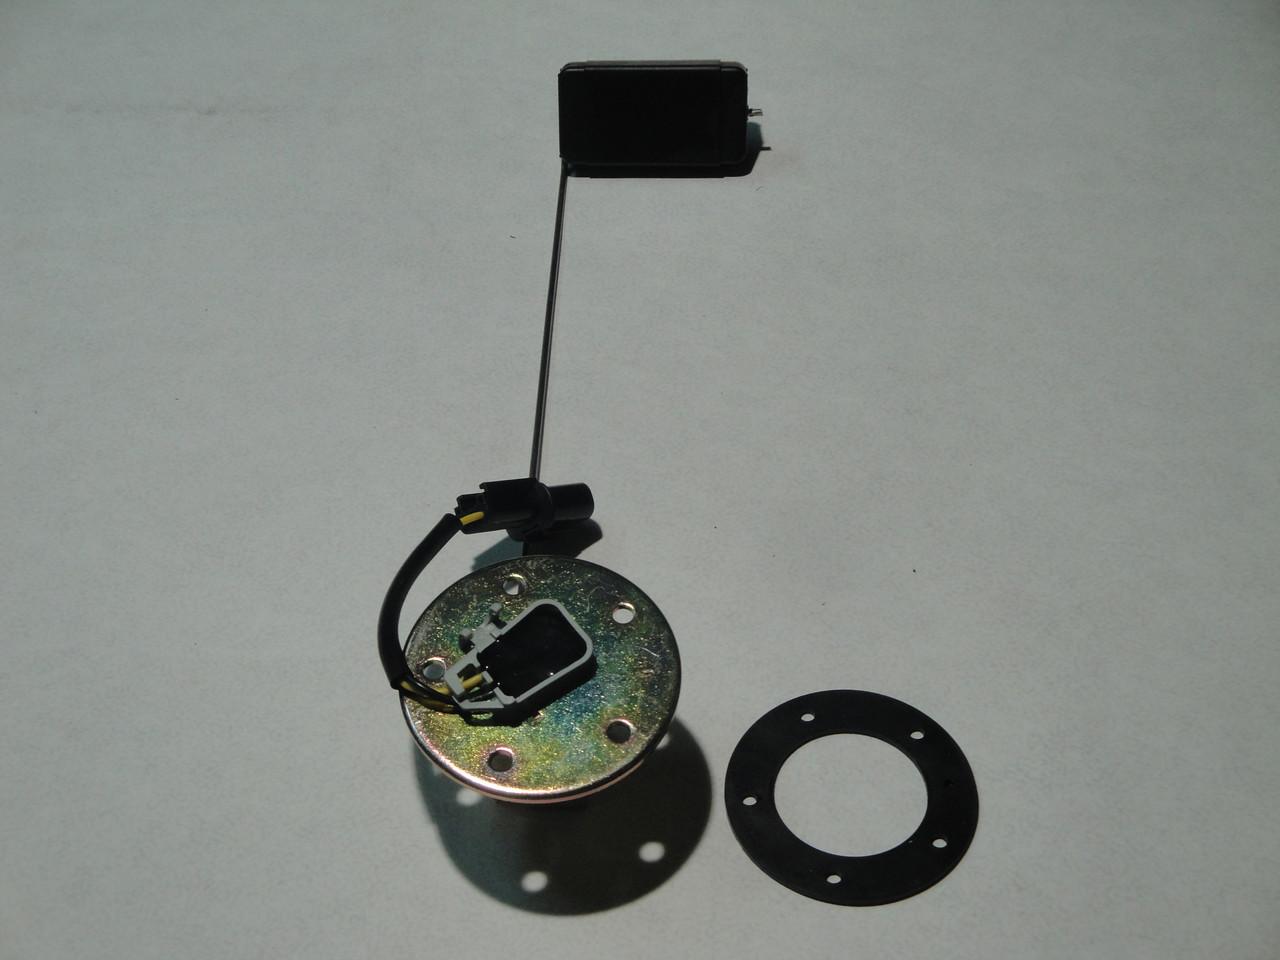 Датчик уровня топлива MITSUBISHI CANTER 659 (MC896134/MK322826) JAPACO